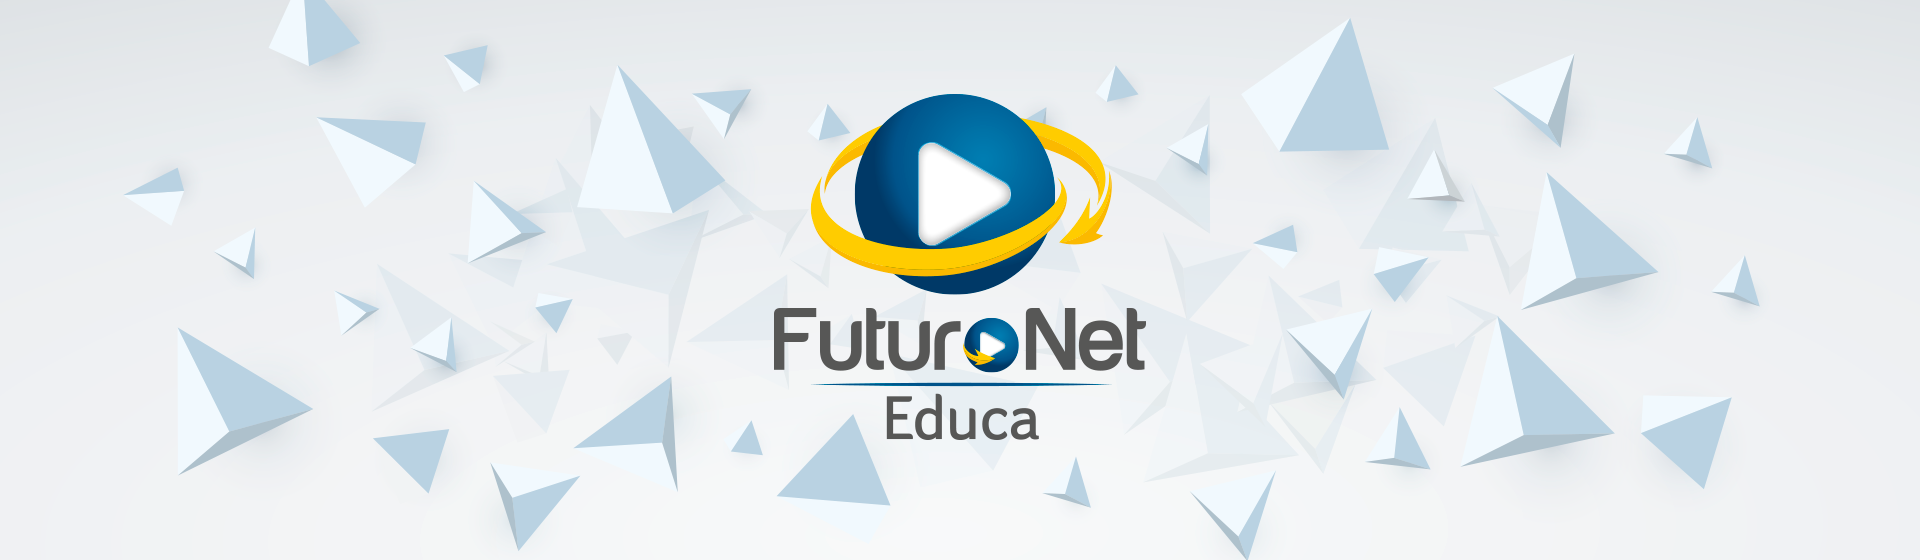 Banner futuronet educa 1920x560